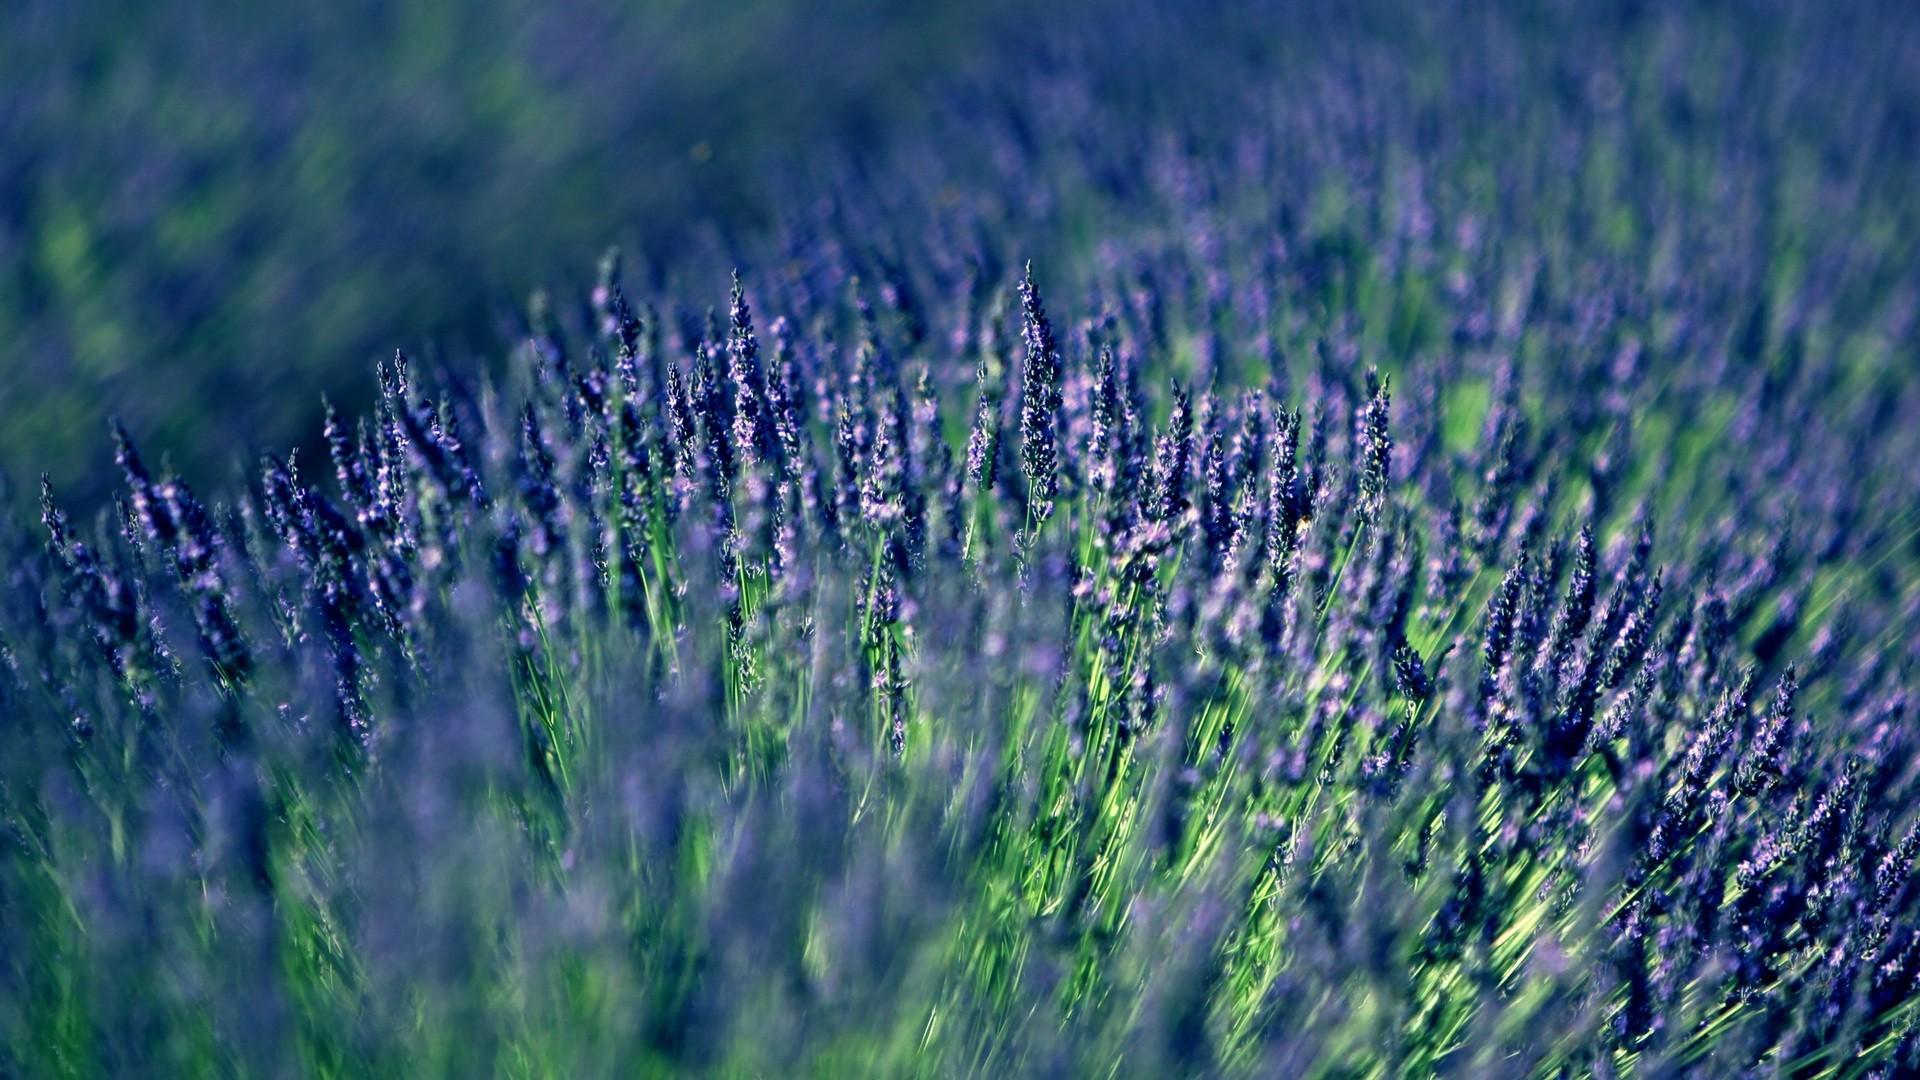 Lavender hd desktop wallpaper